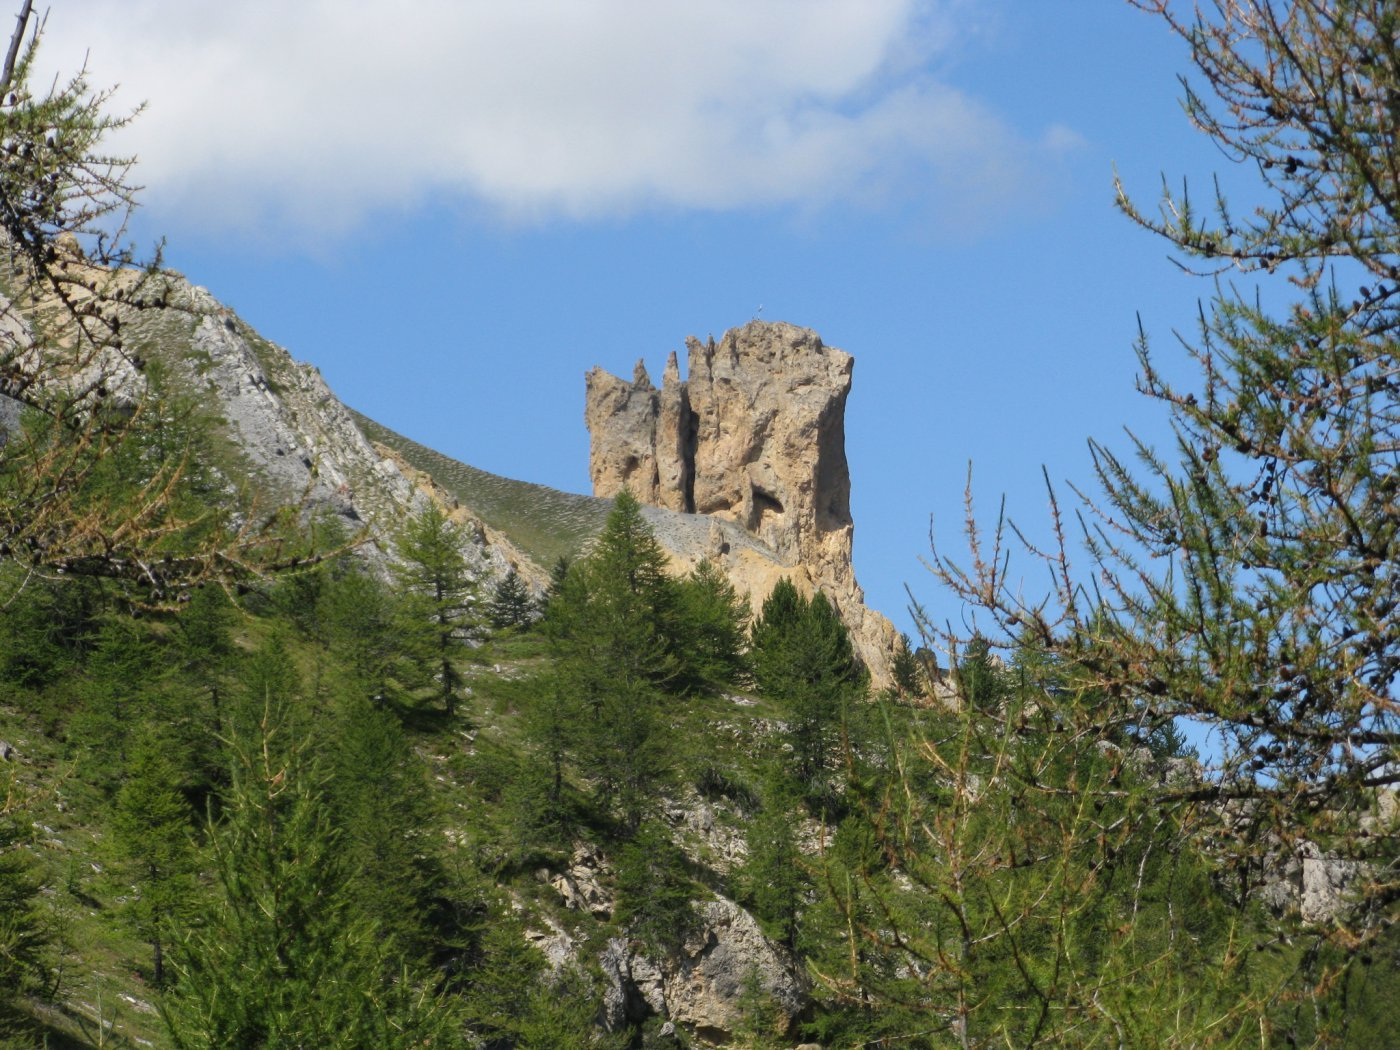 il caratteristico torrione Tour Jaune de Barrabas